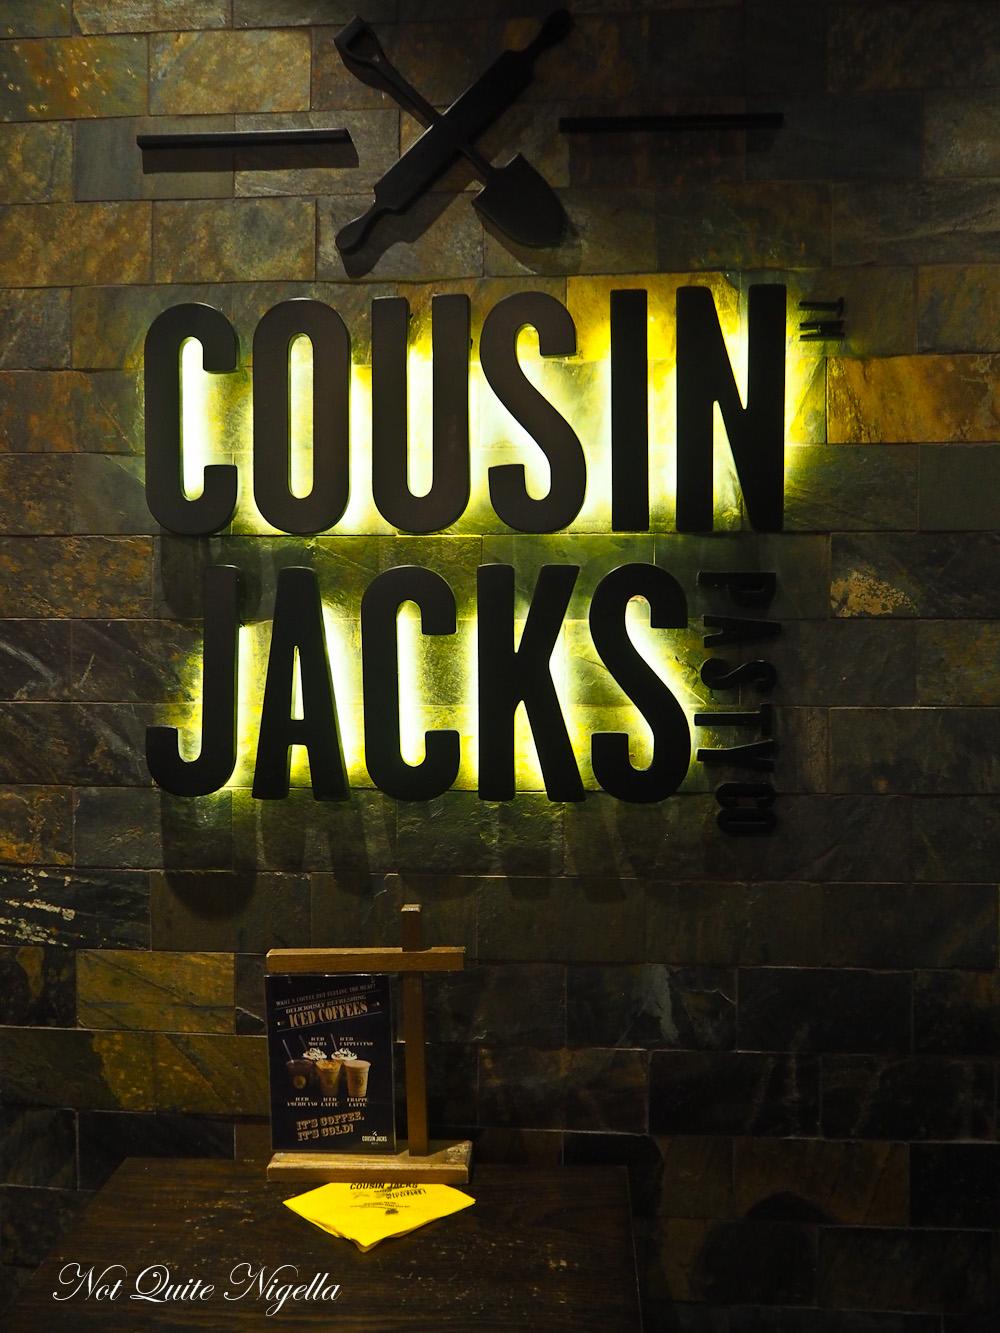 Cousin Jack's Pasties